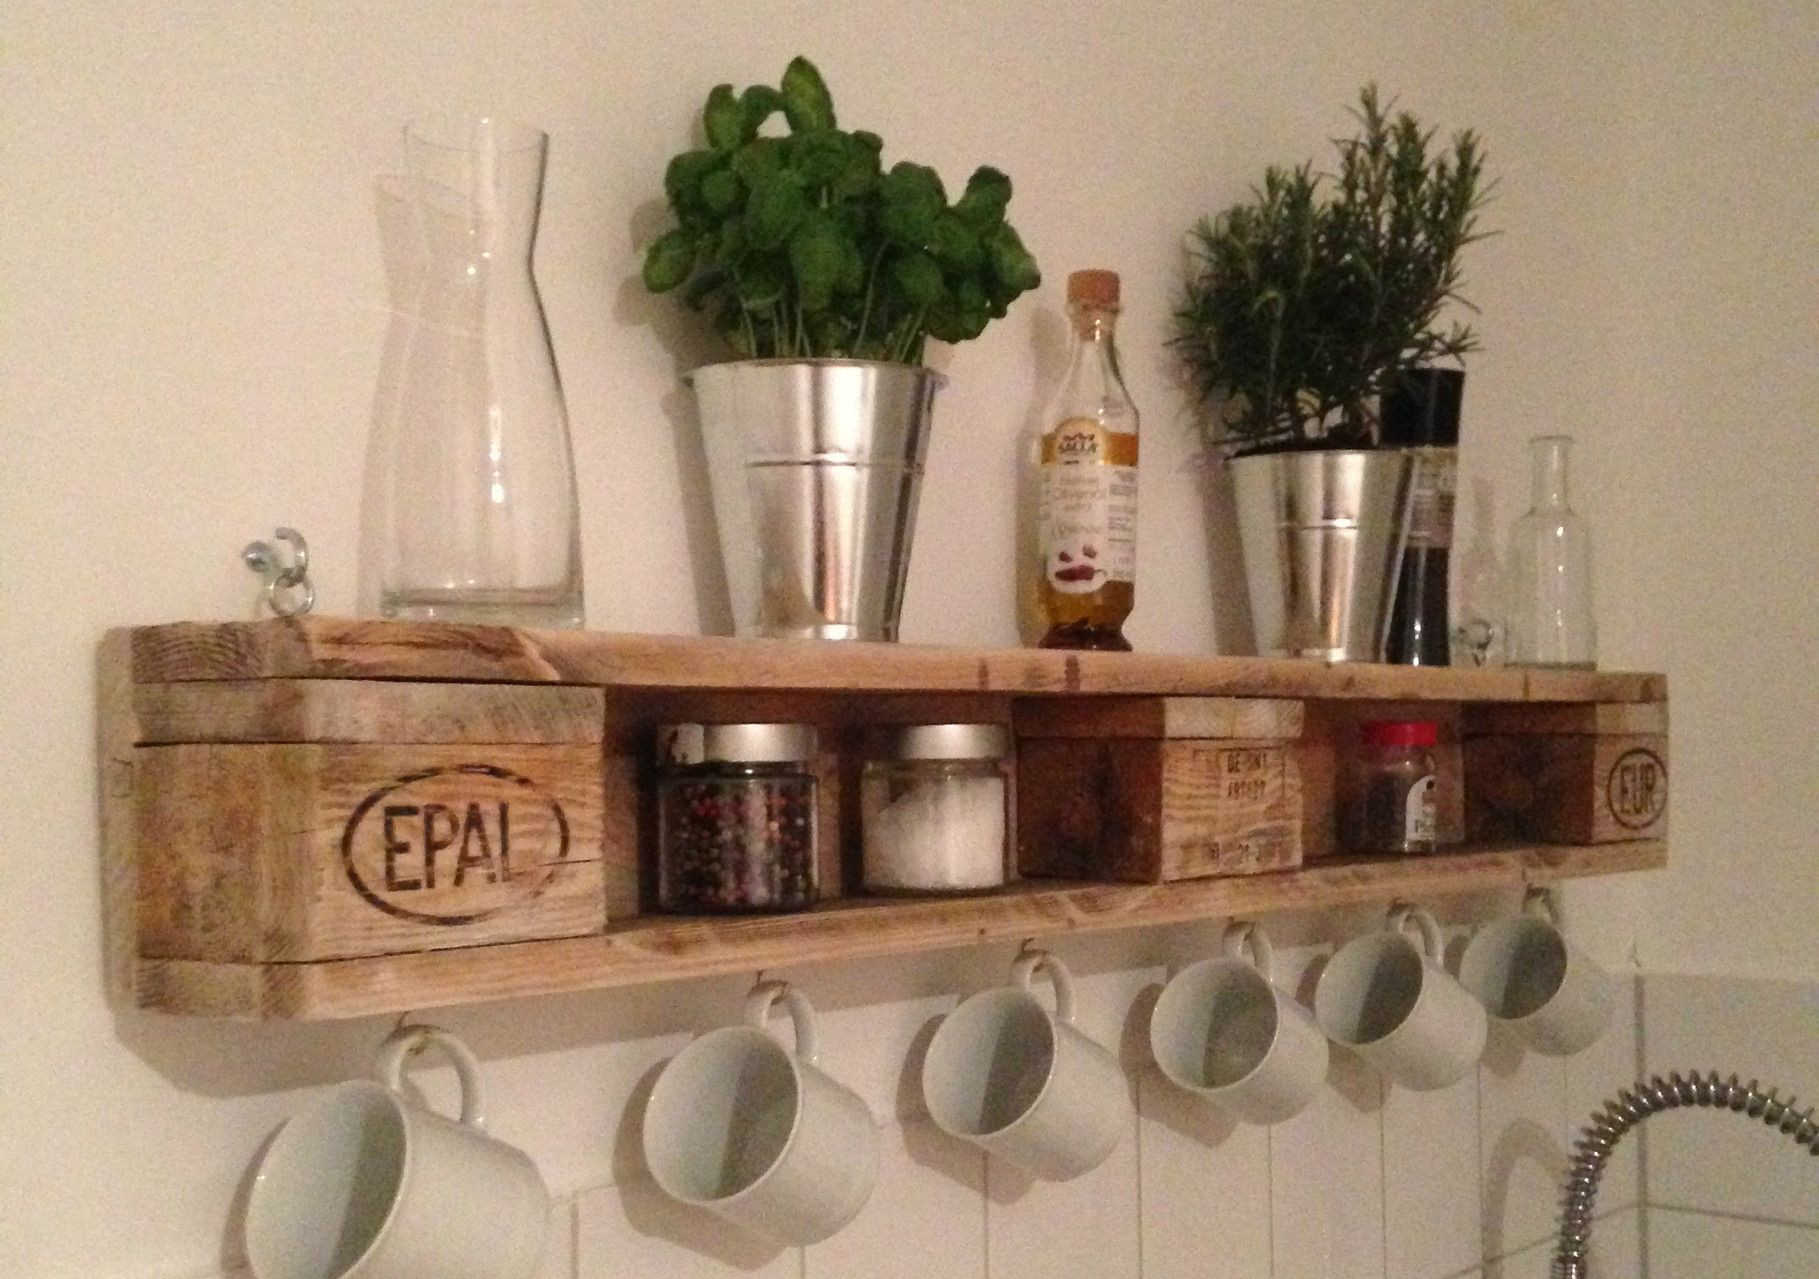 Diy Europalette  DIY Wandregal aus Europaletten europalette kitchen